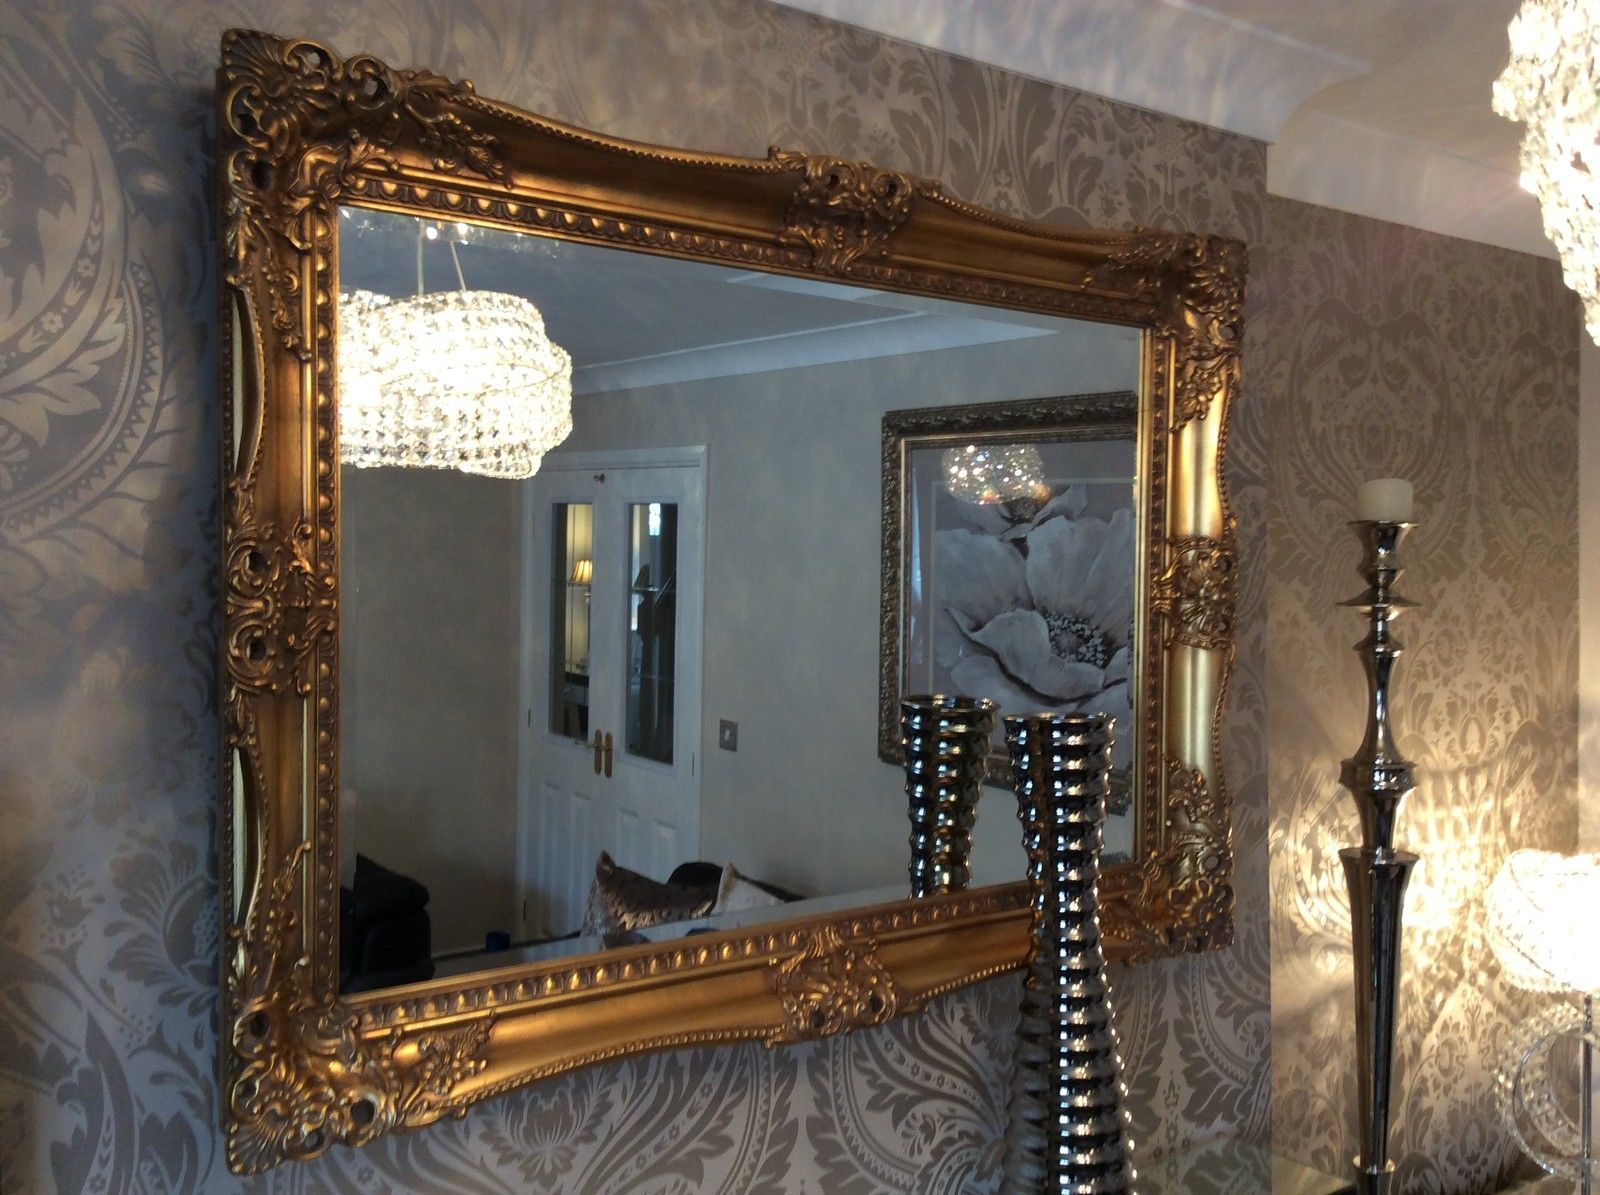 X Large Bright Metallic Silver Ornate Decorative Wall